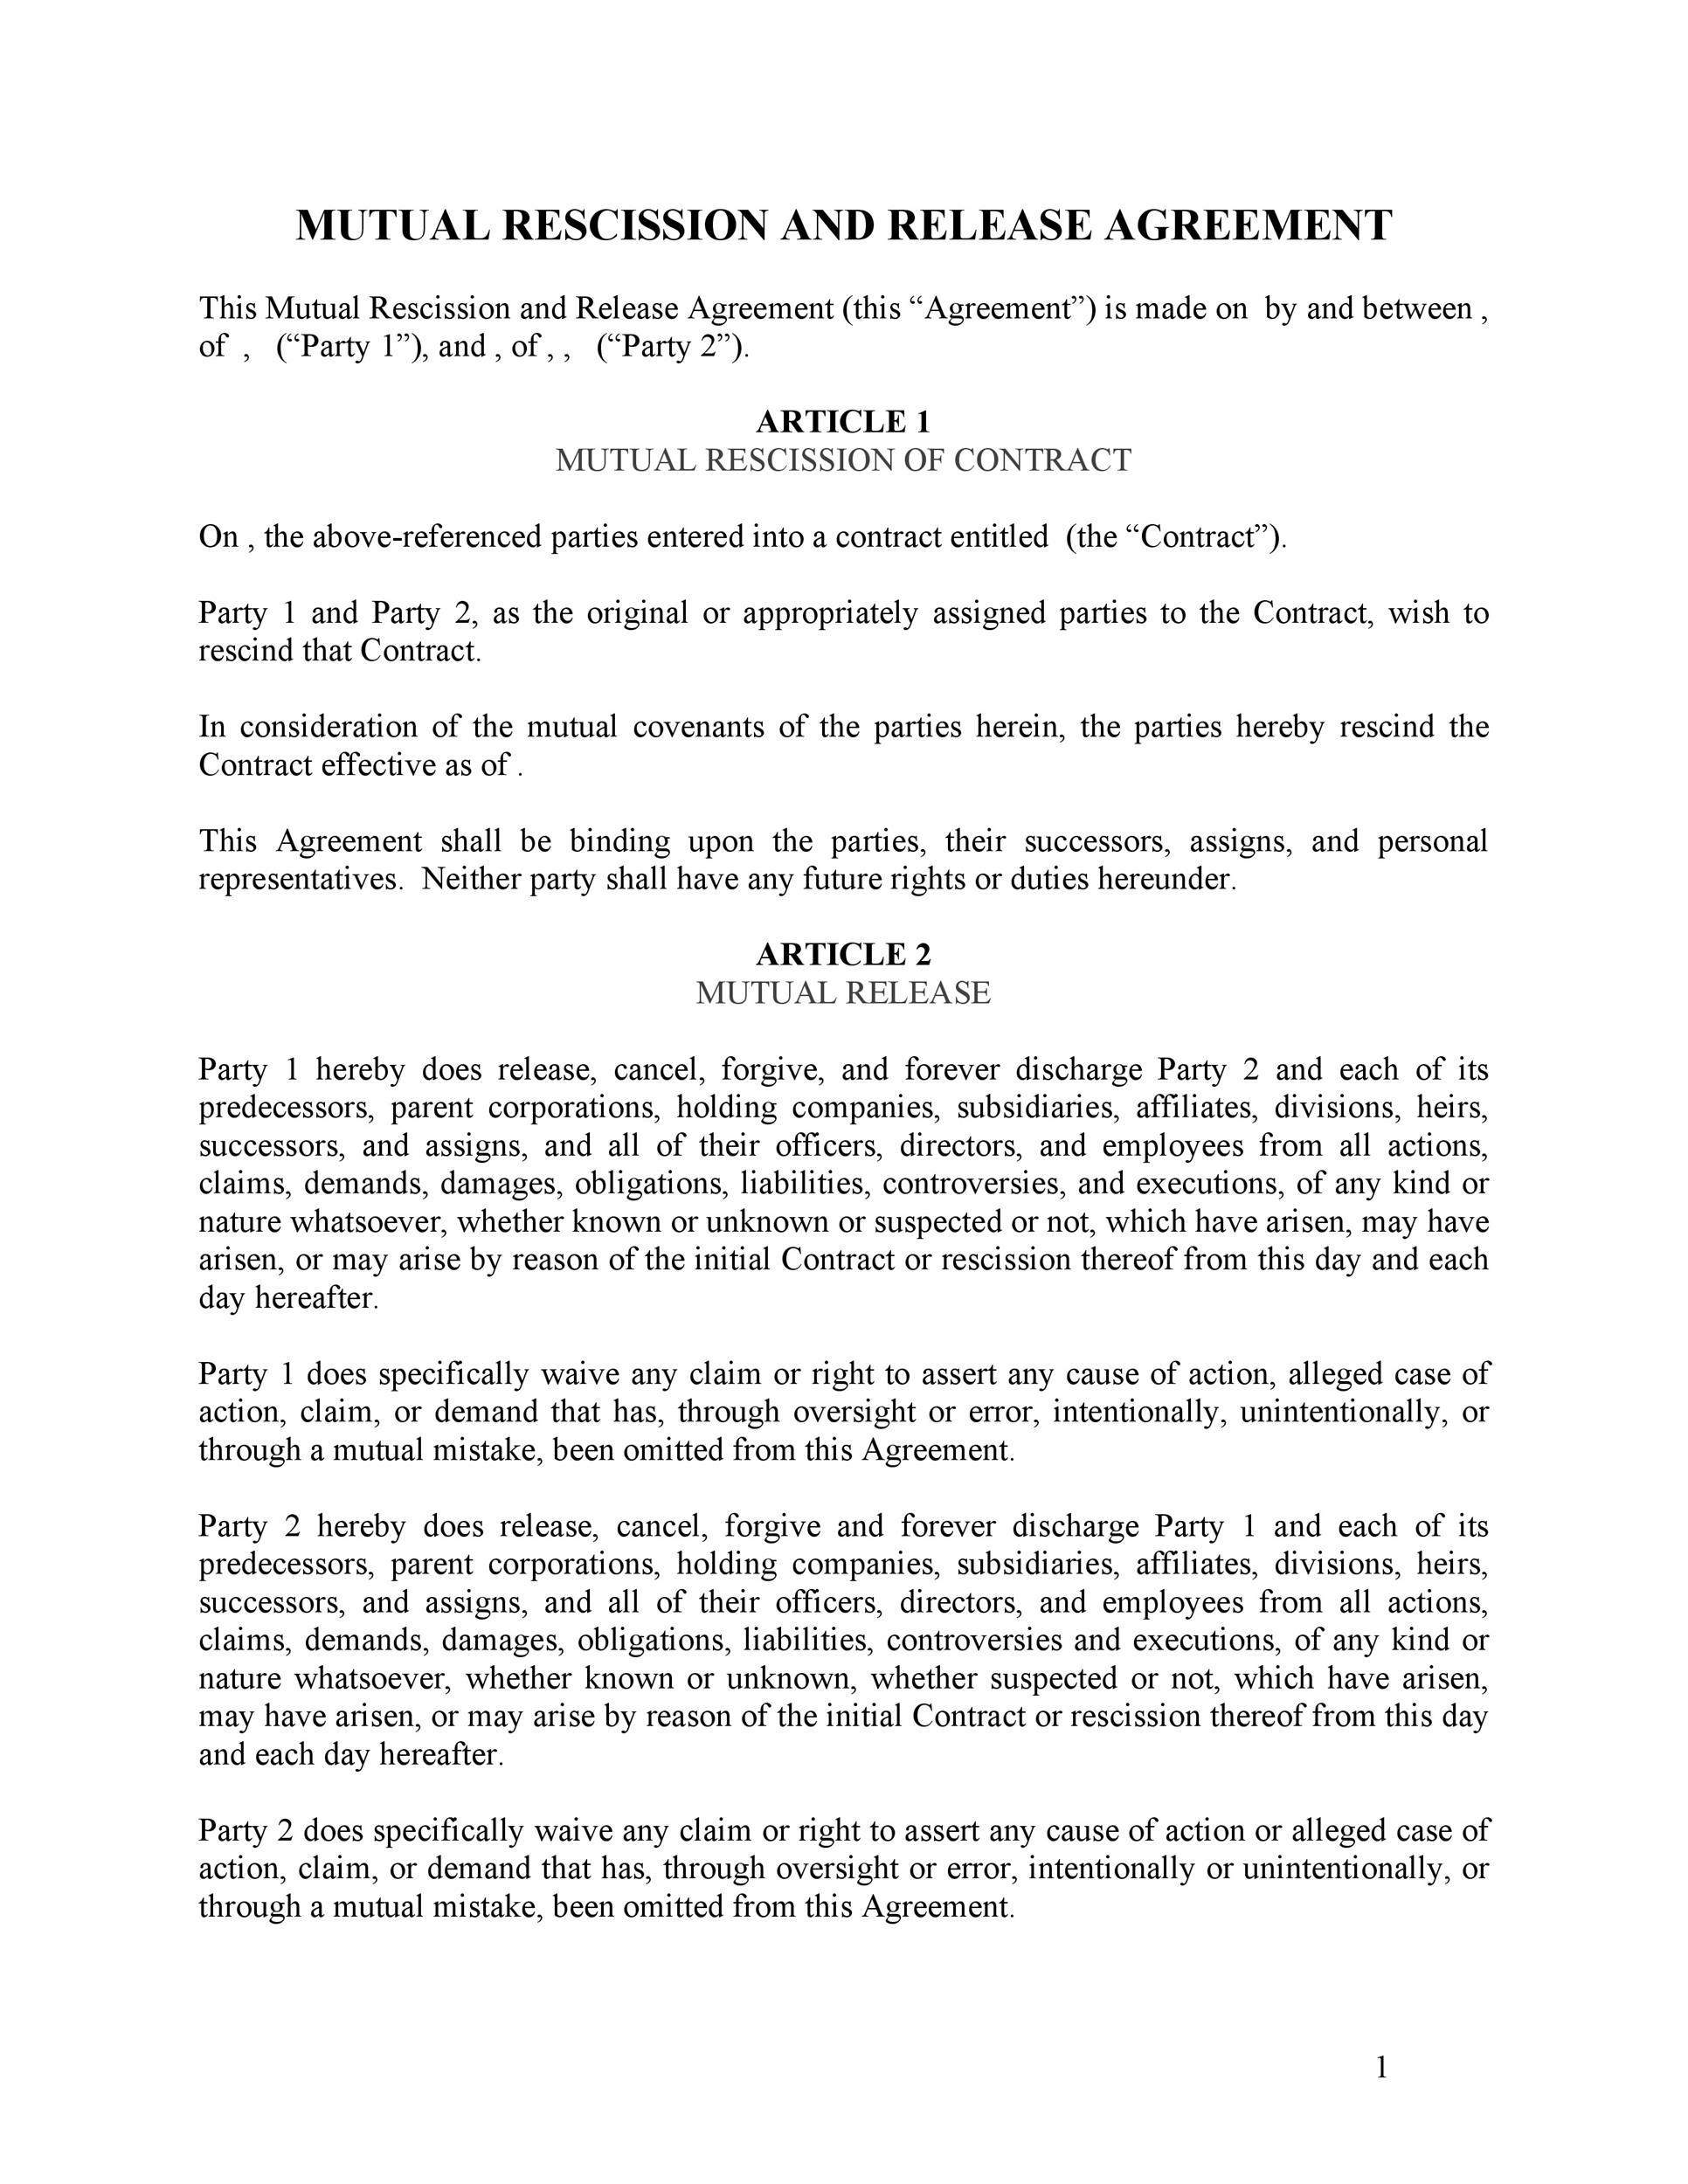 Free rescission agreement 05